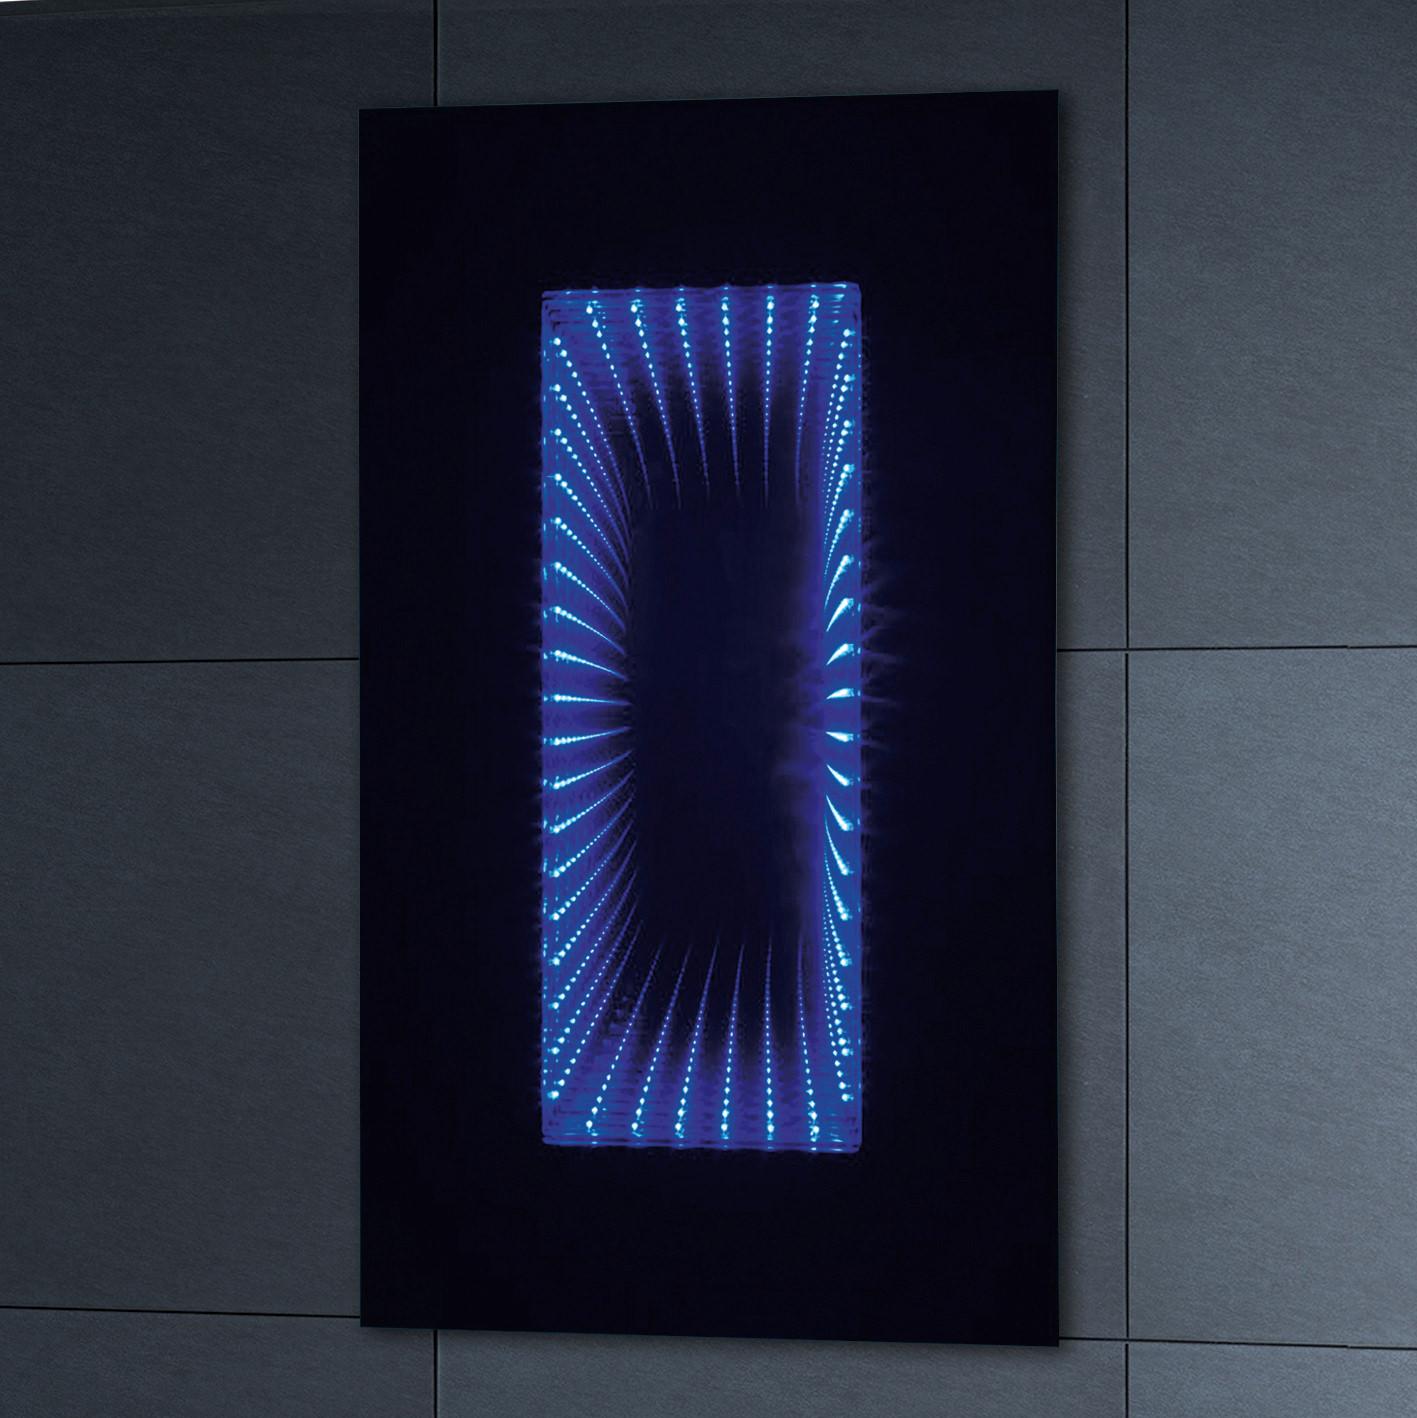 Phoenix infiniti led illuminated mirror 900 x 500mm for Illuminated mirrors